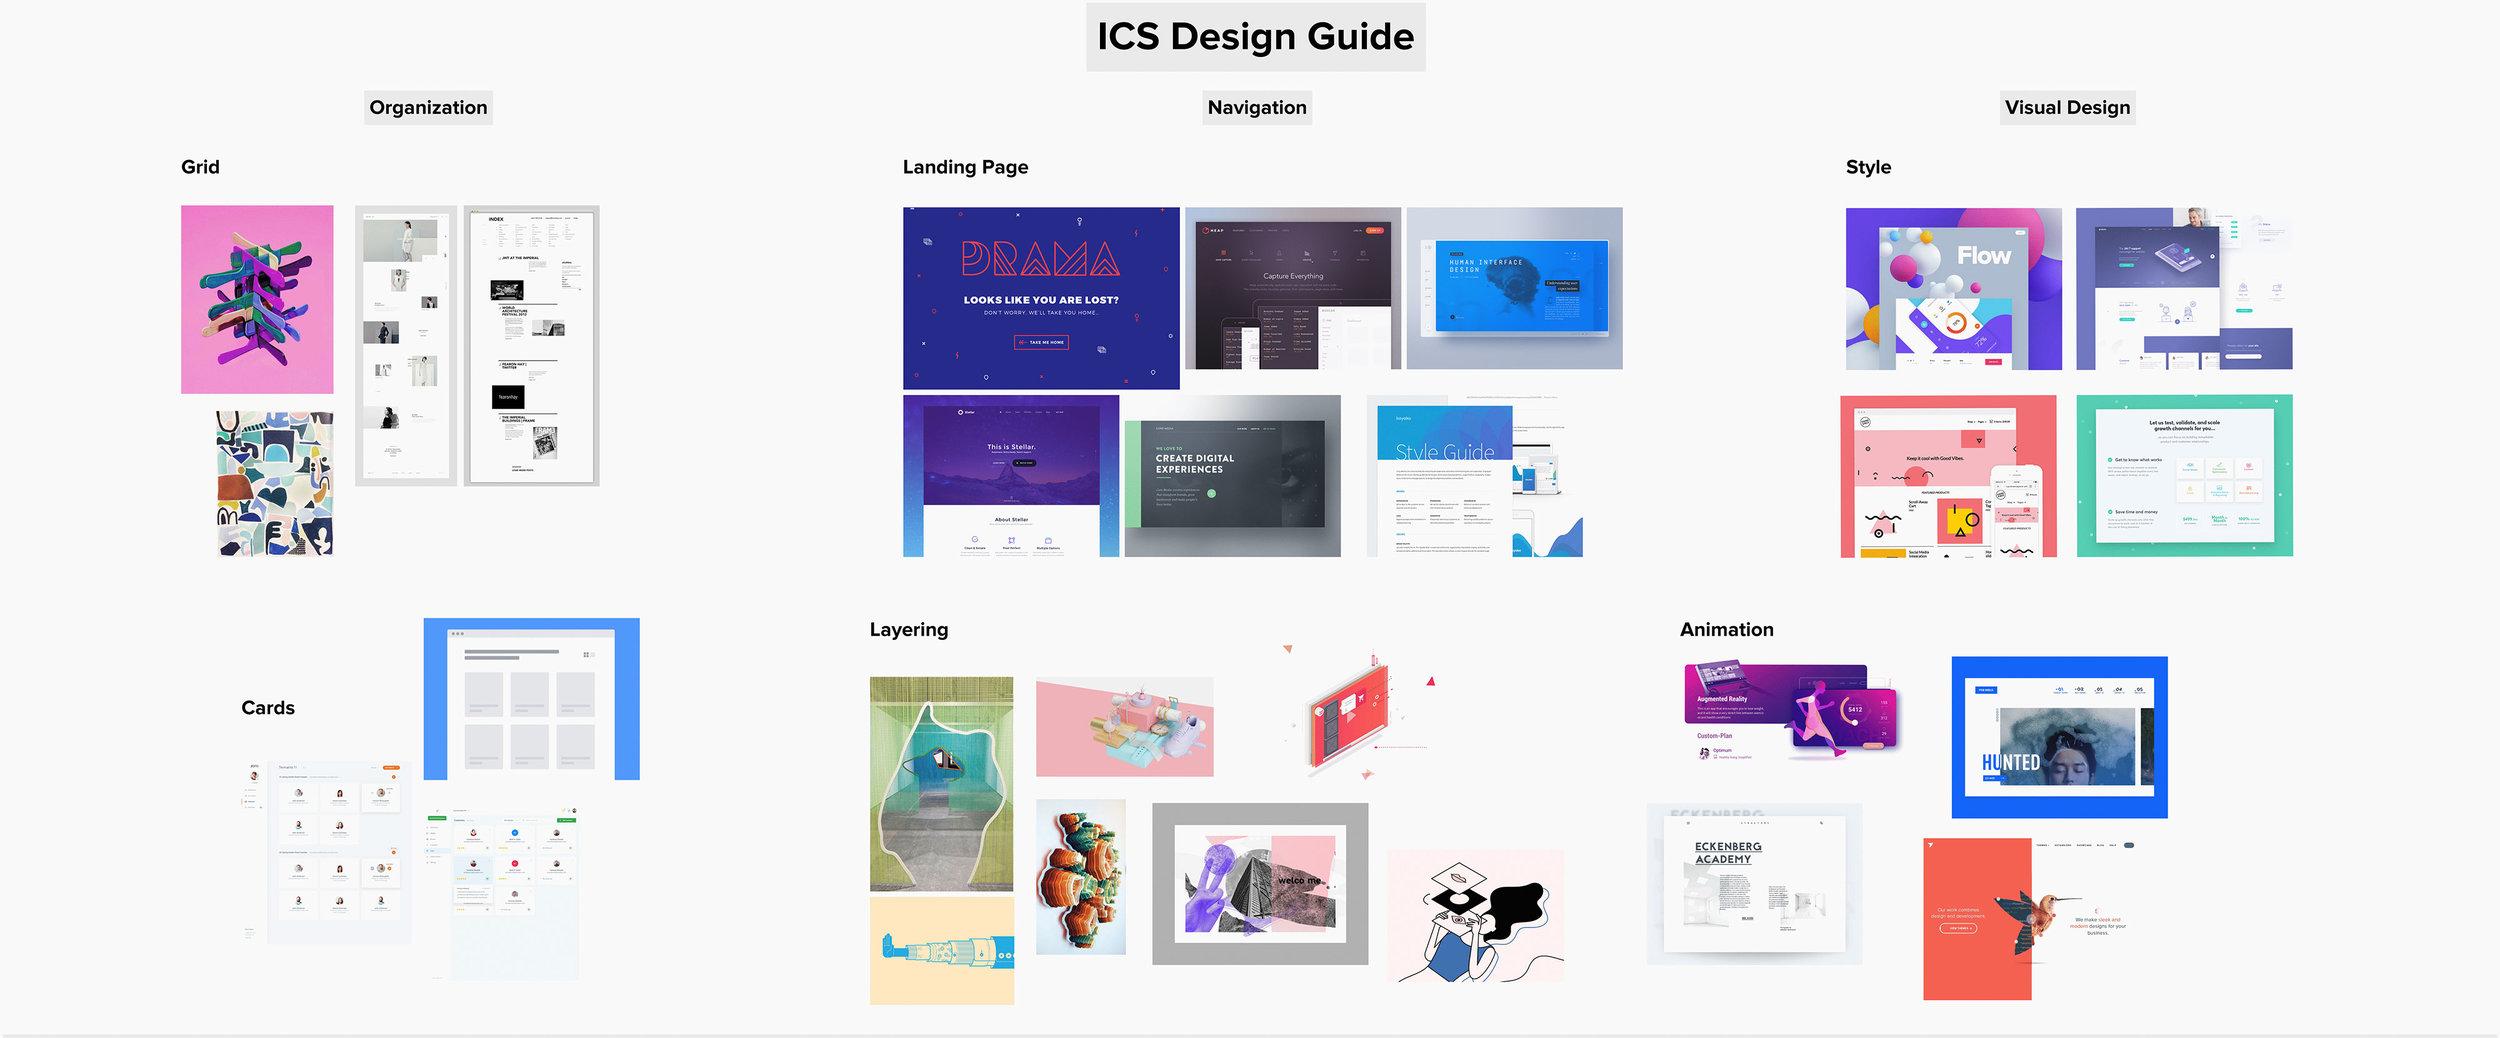 Design-Guide-Moodboard.jpg